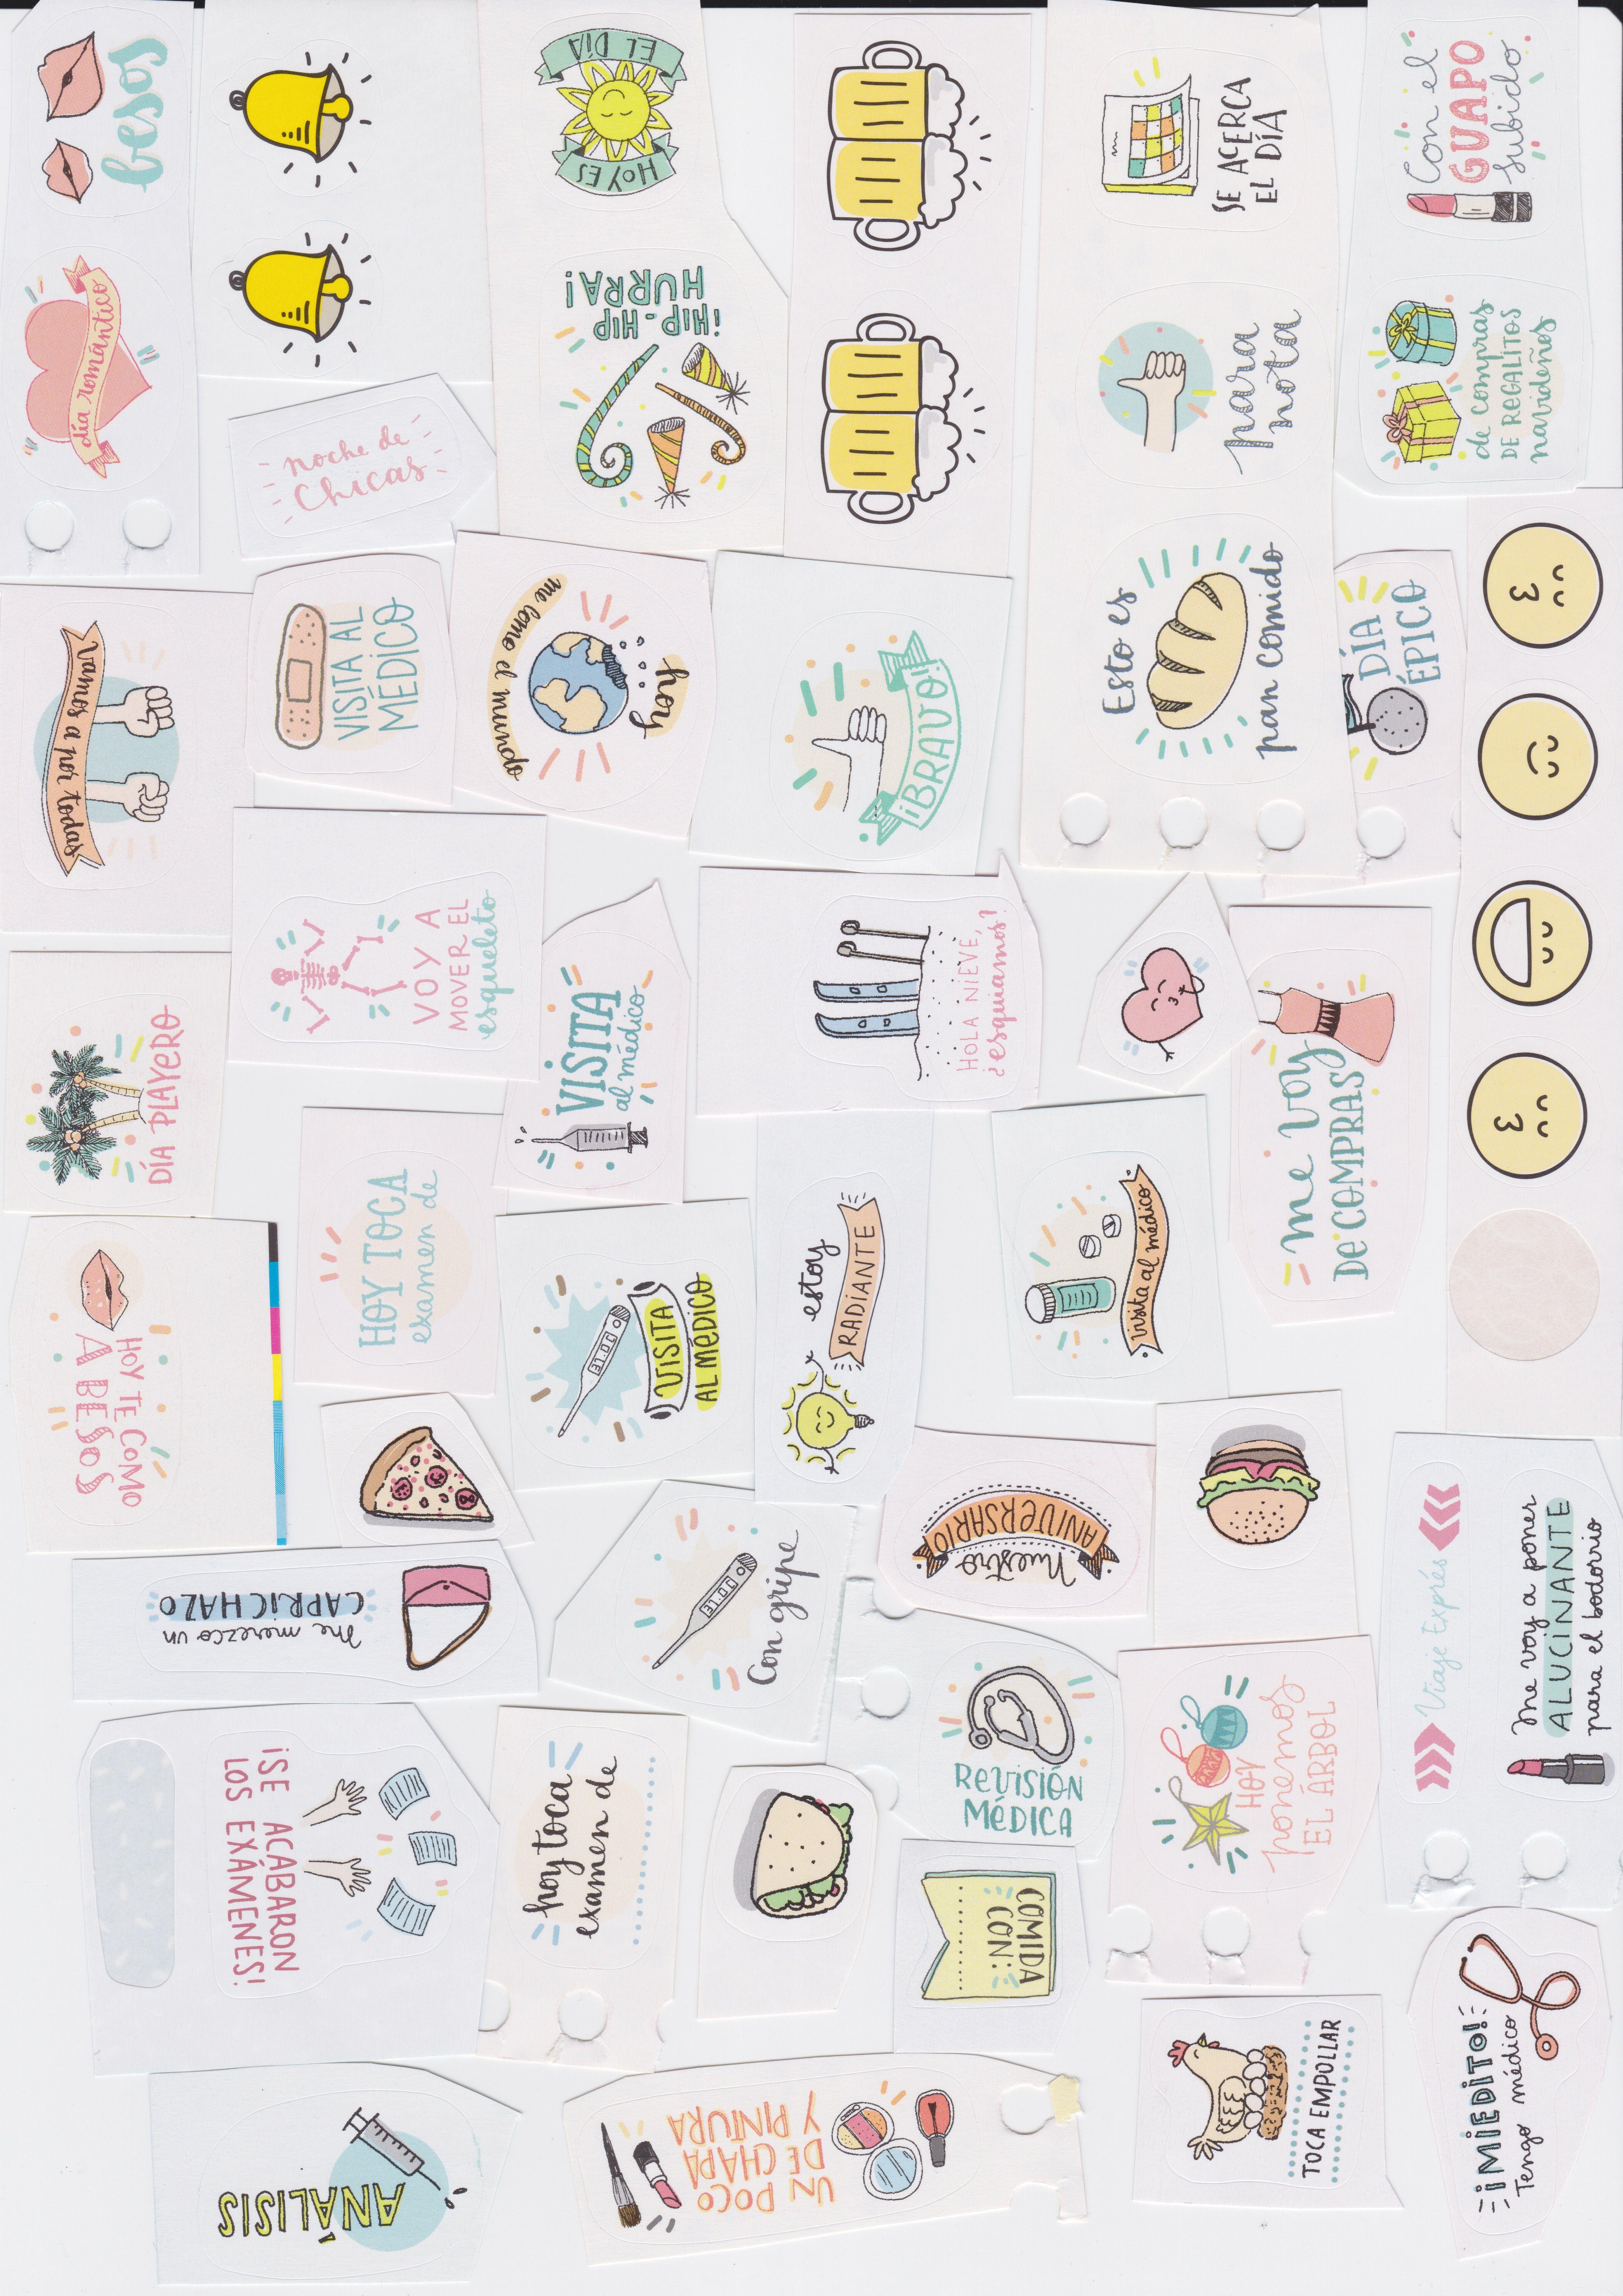 Pegatinas de varias agendas de MrWonderful para imprimir en papel